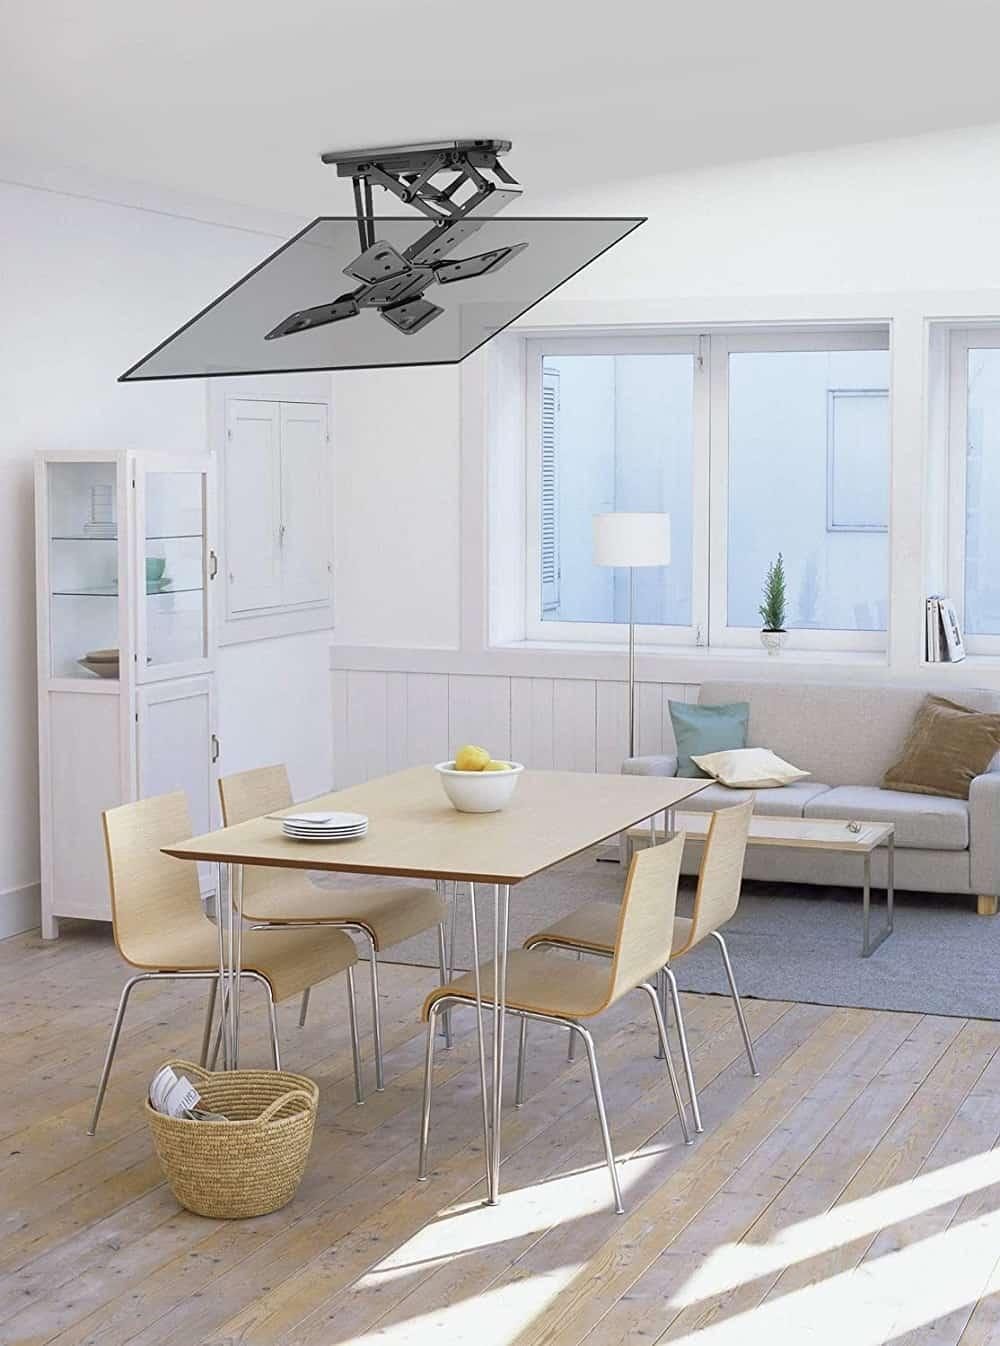 Moterized flip down tv mount in the kitchen